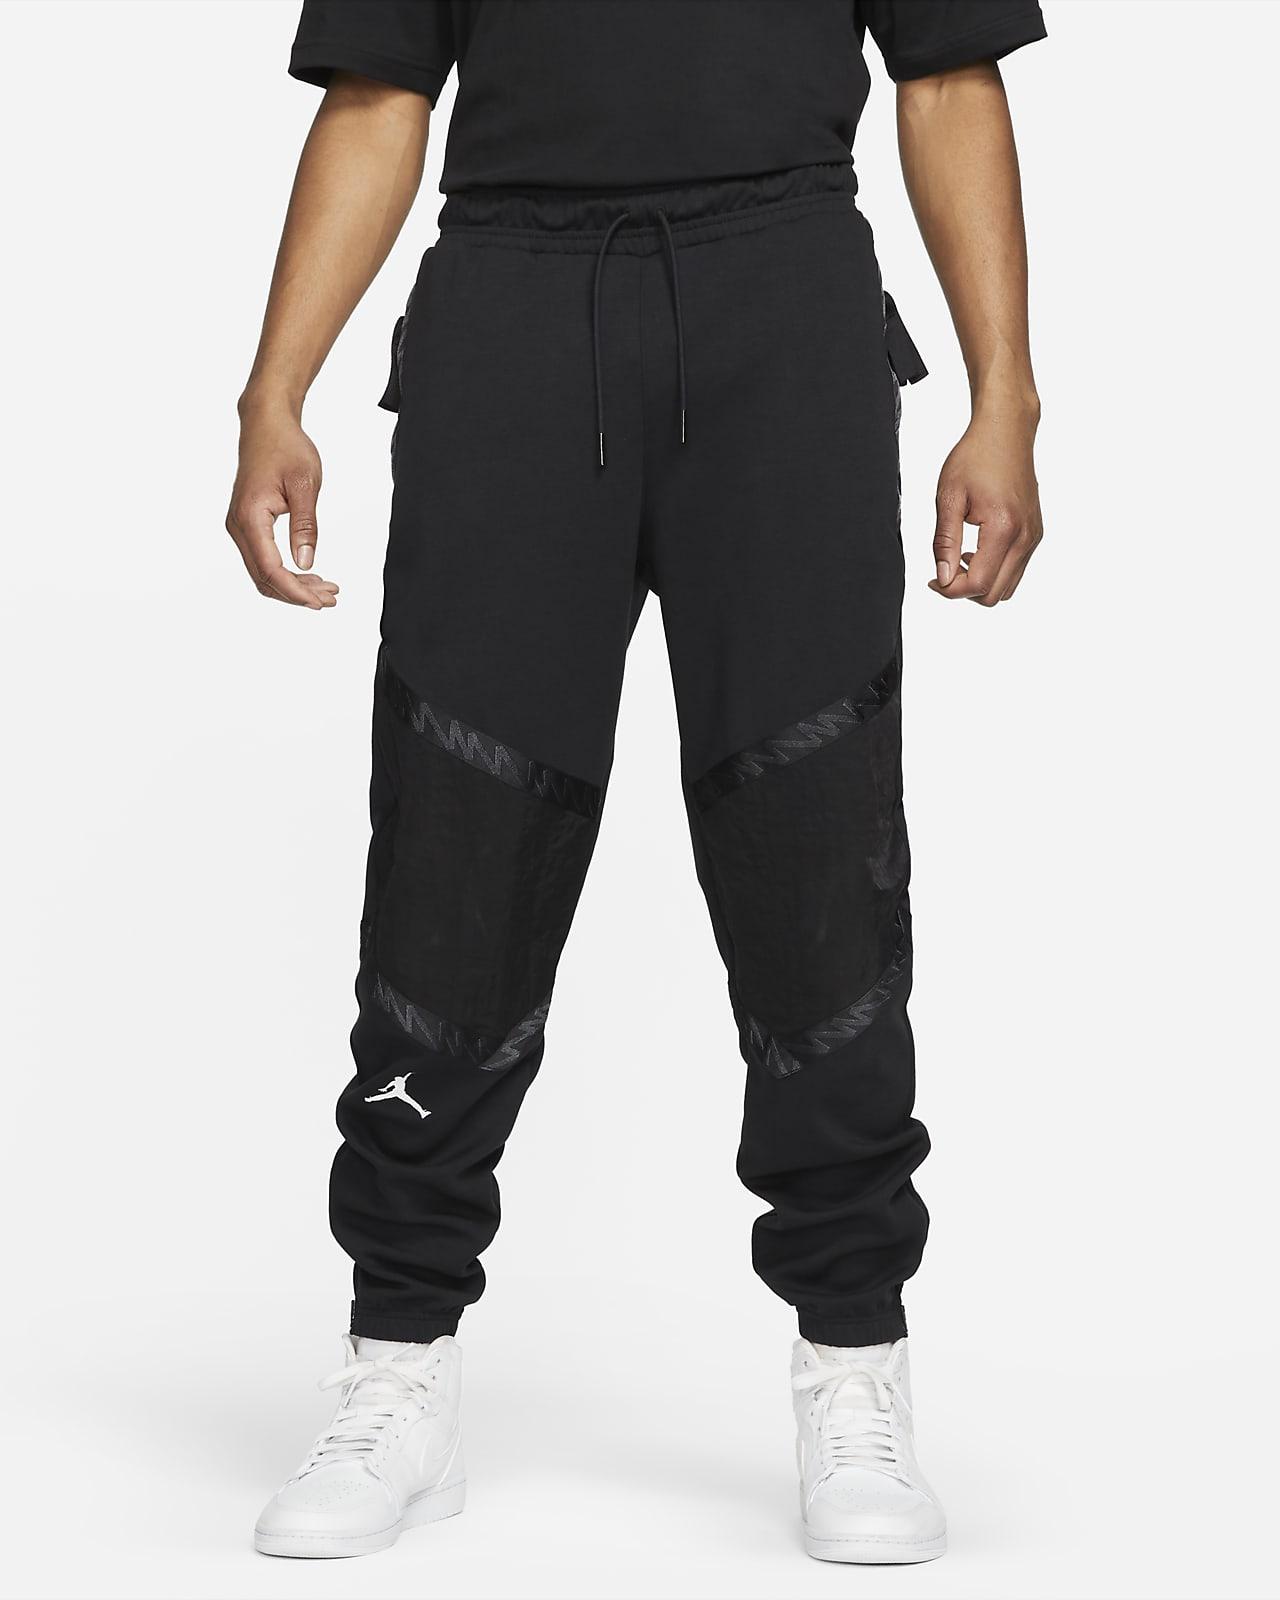 Pantalon en tissu Fleece Jordan Dri-FIT Zion pour Homme